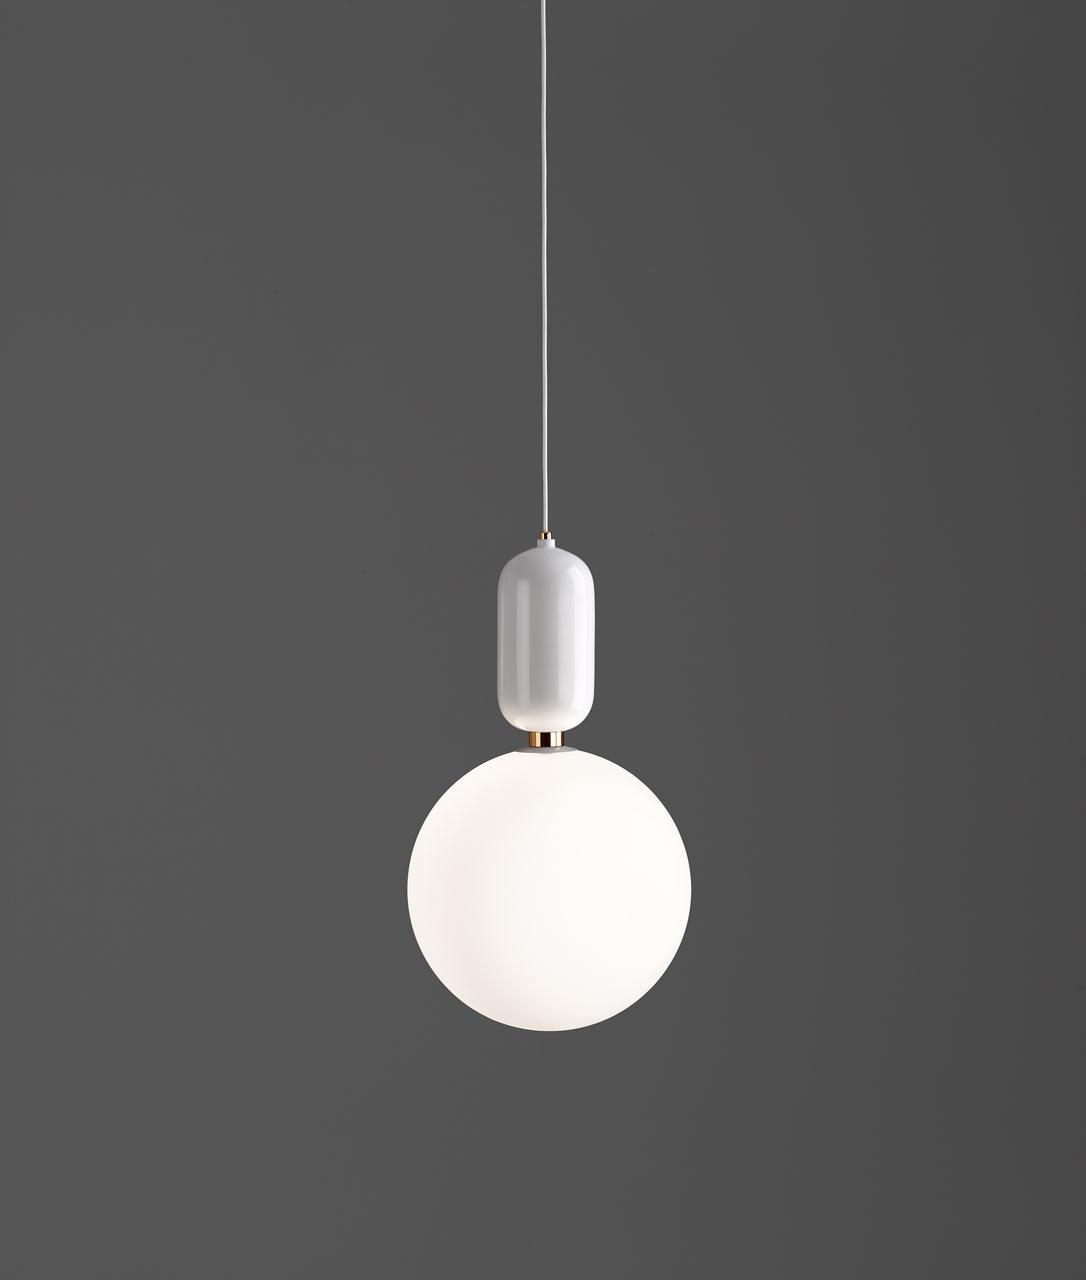 Parachilna-Lighting-15-Aballs-Hayon